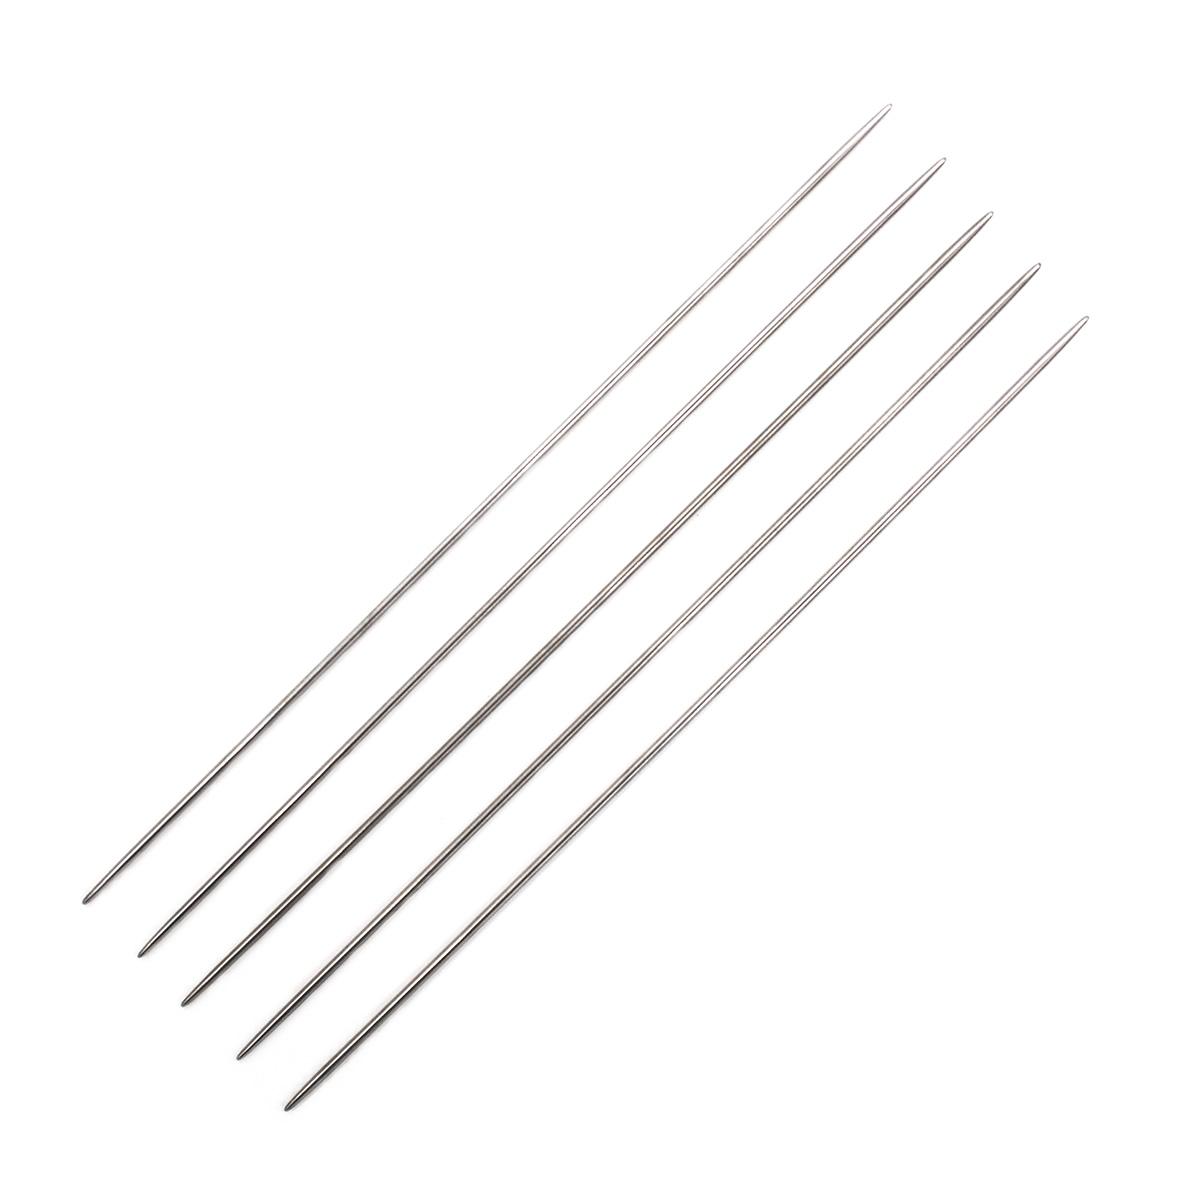 Спицы носочные металл 941520, 20 см, 2,0 мм, Hobby&Pro